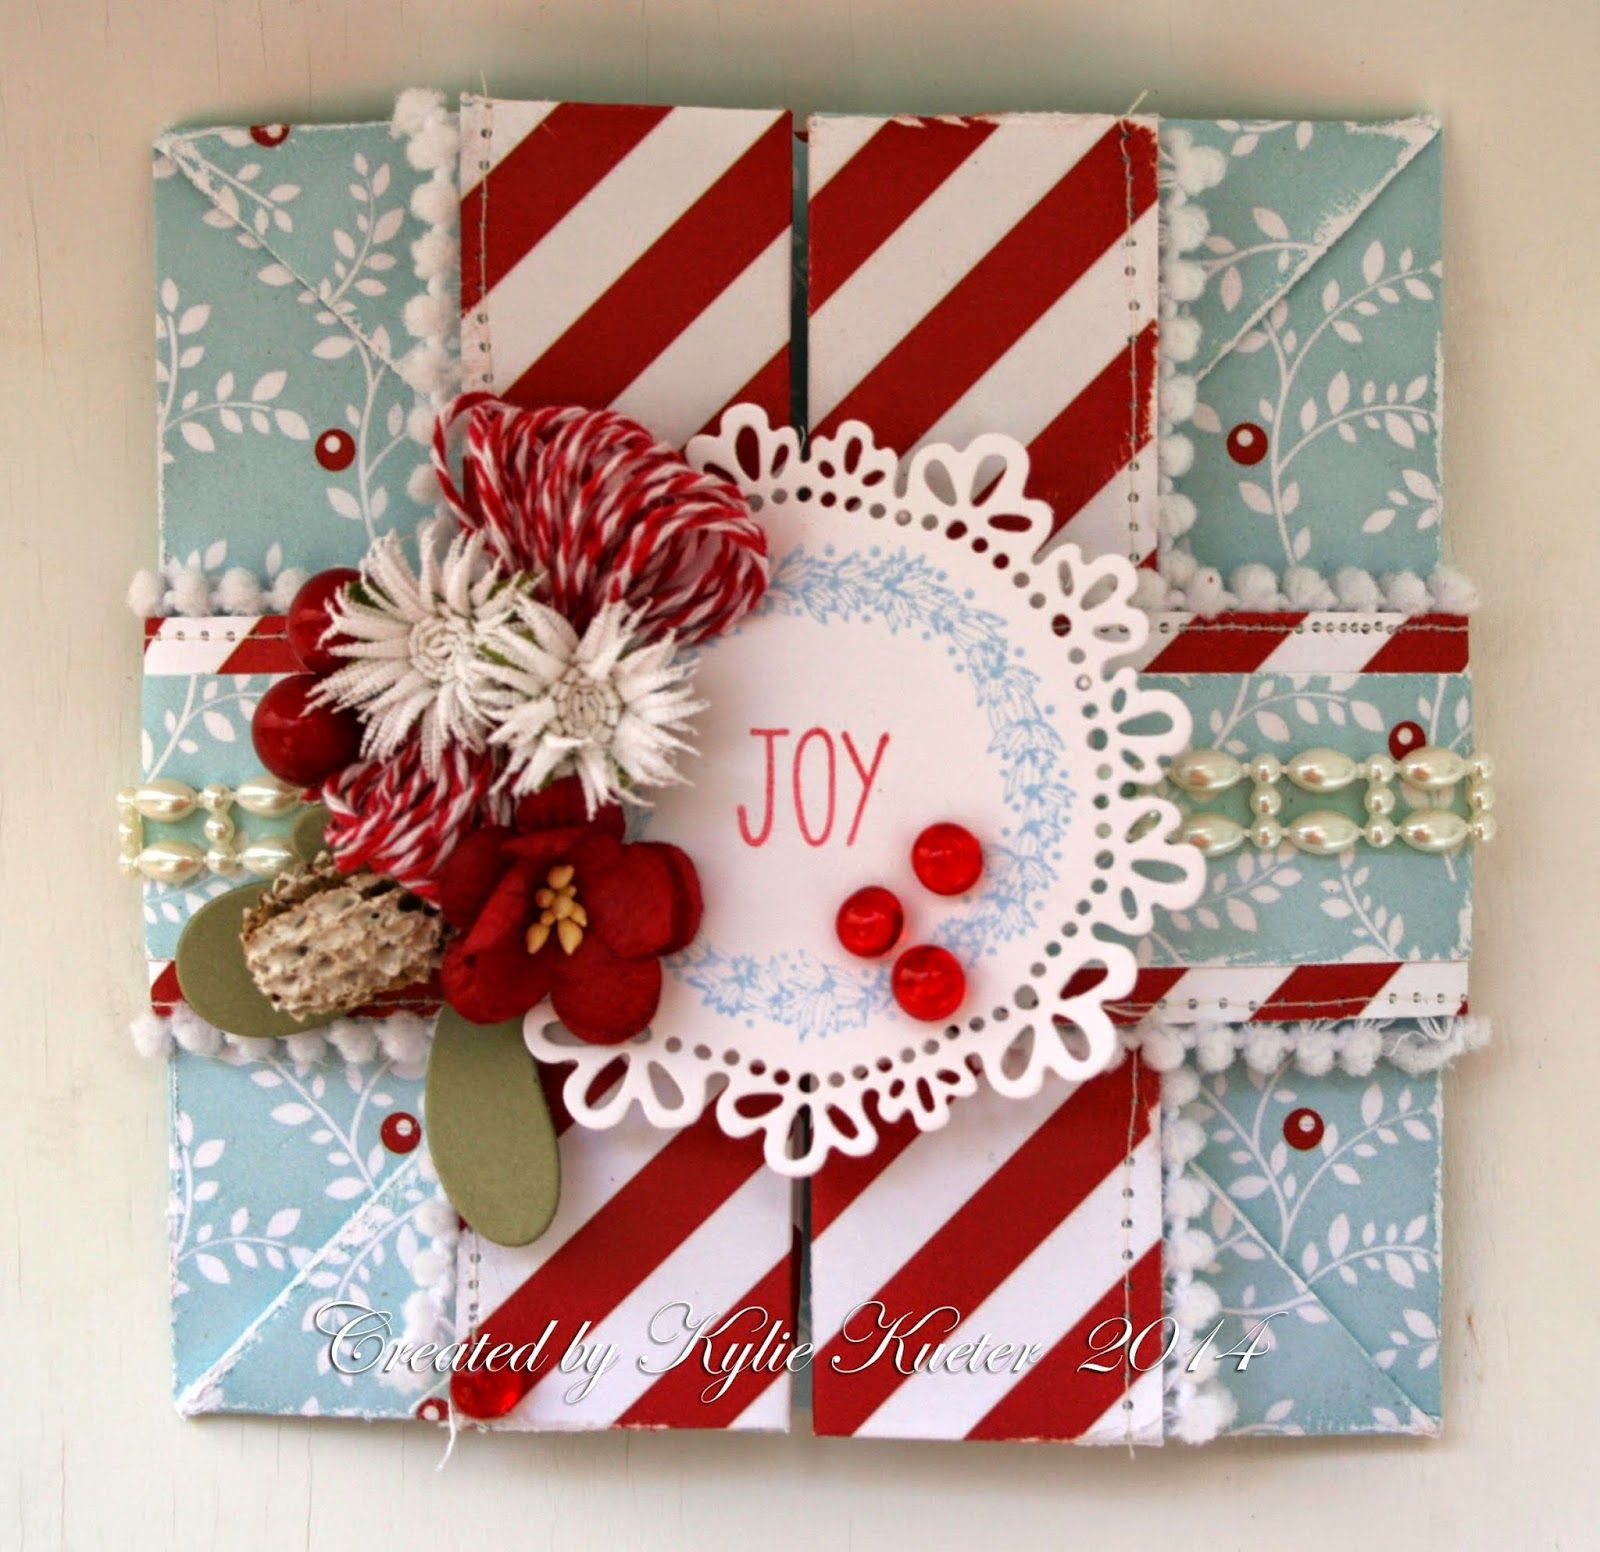 Ribbon Girl Card Challennge - Christmas